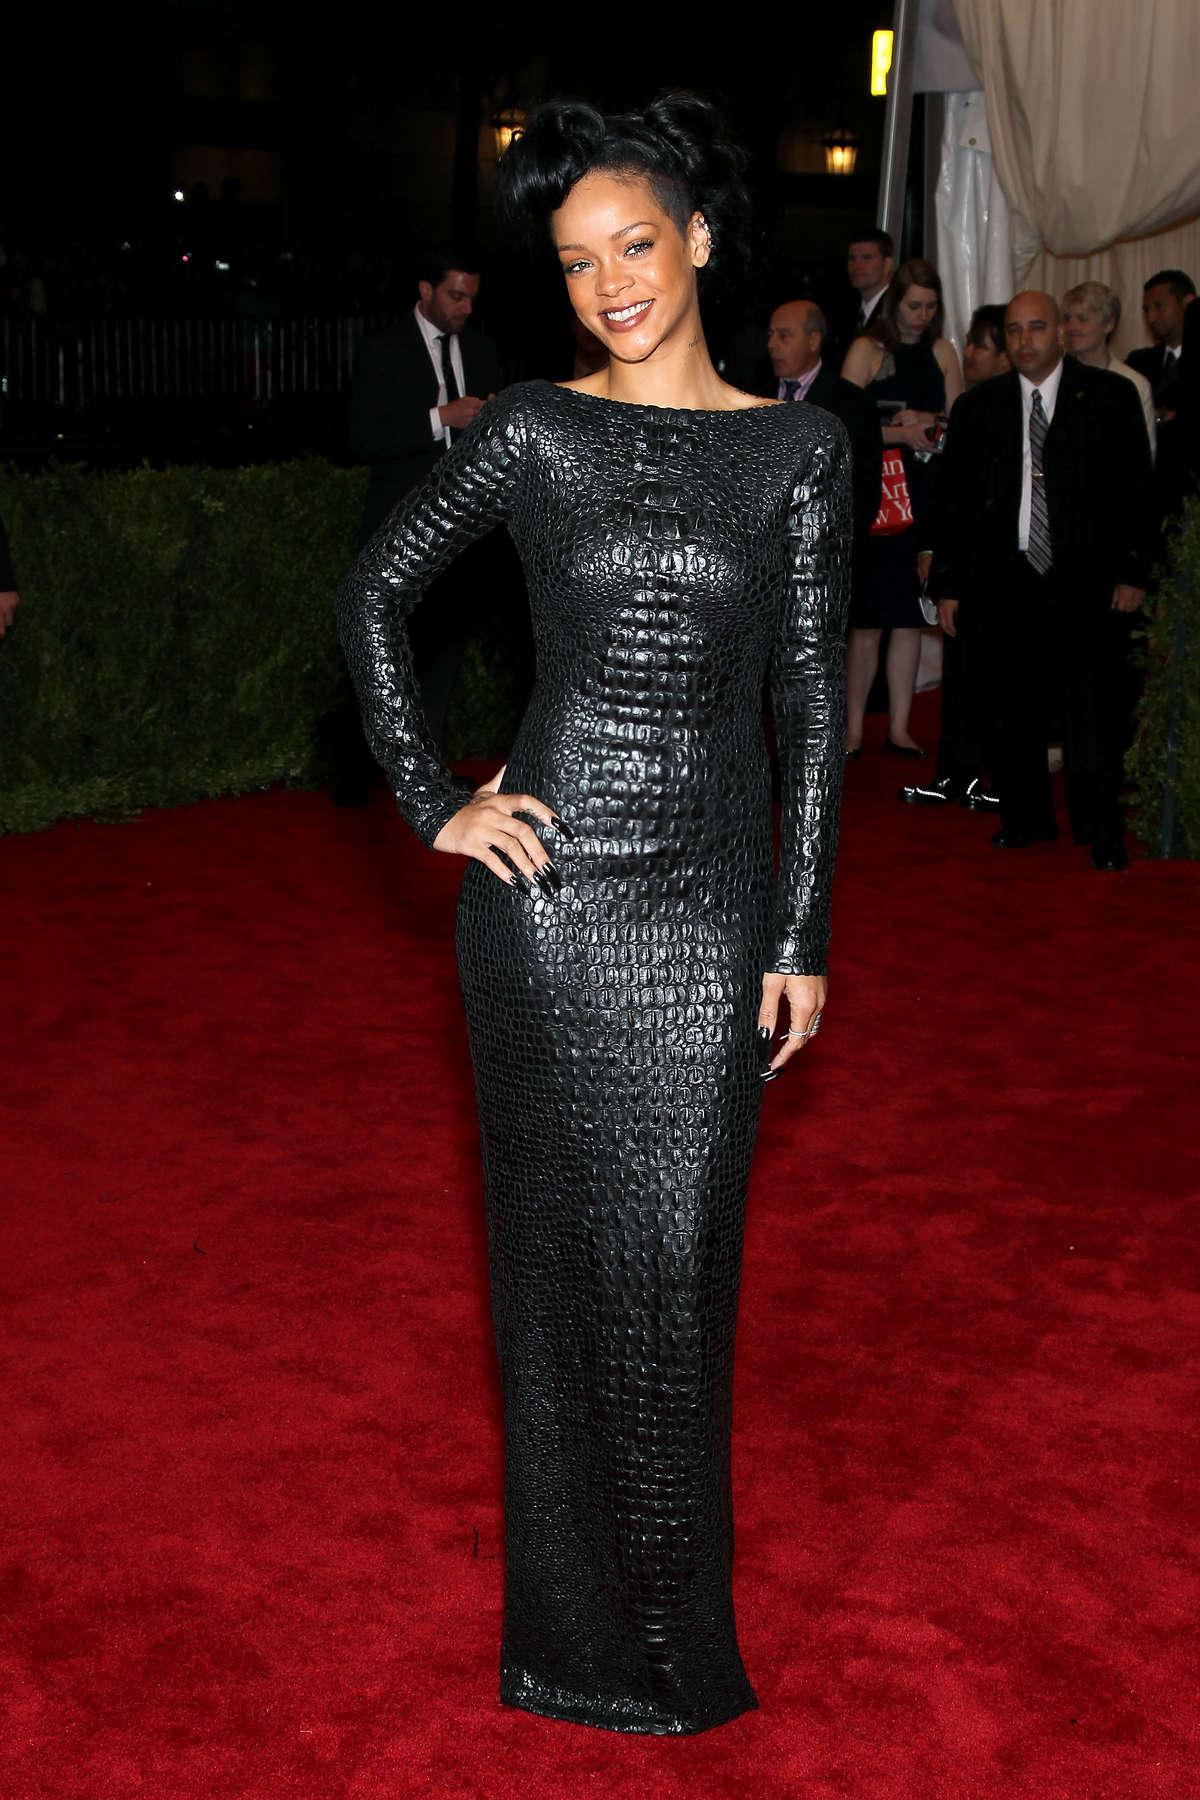 Rihanna - 2012 Met Gala